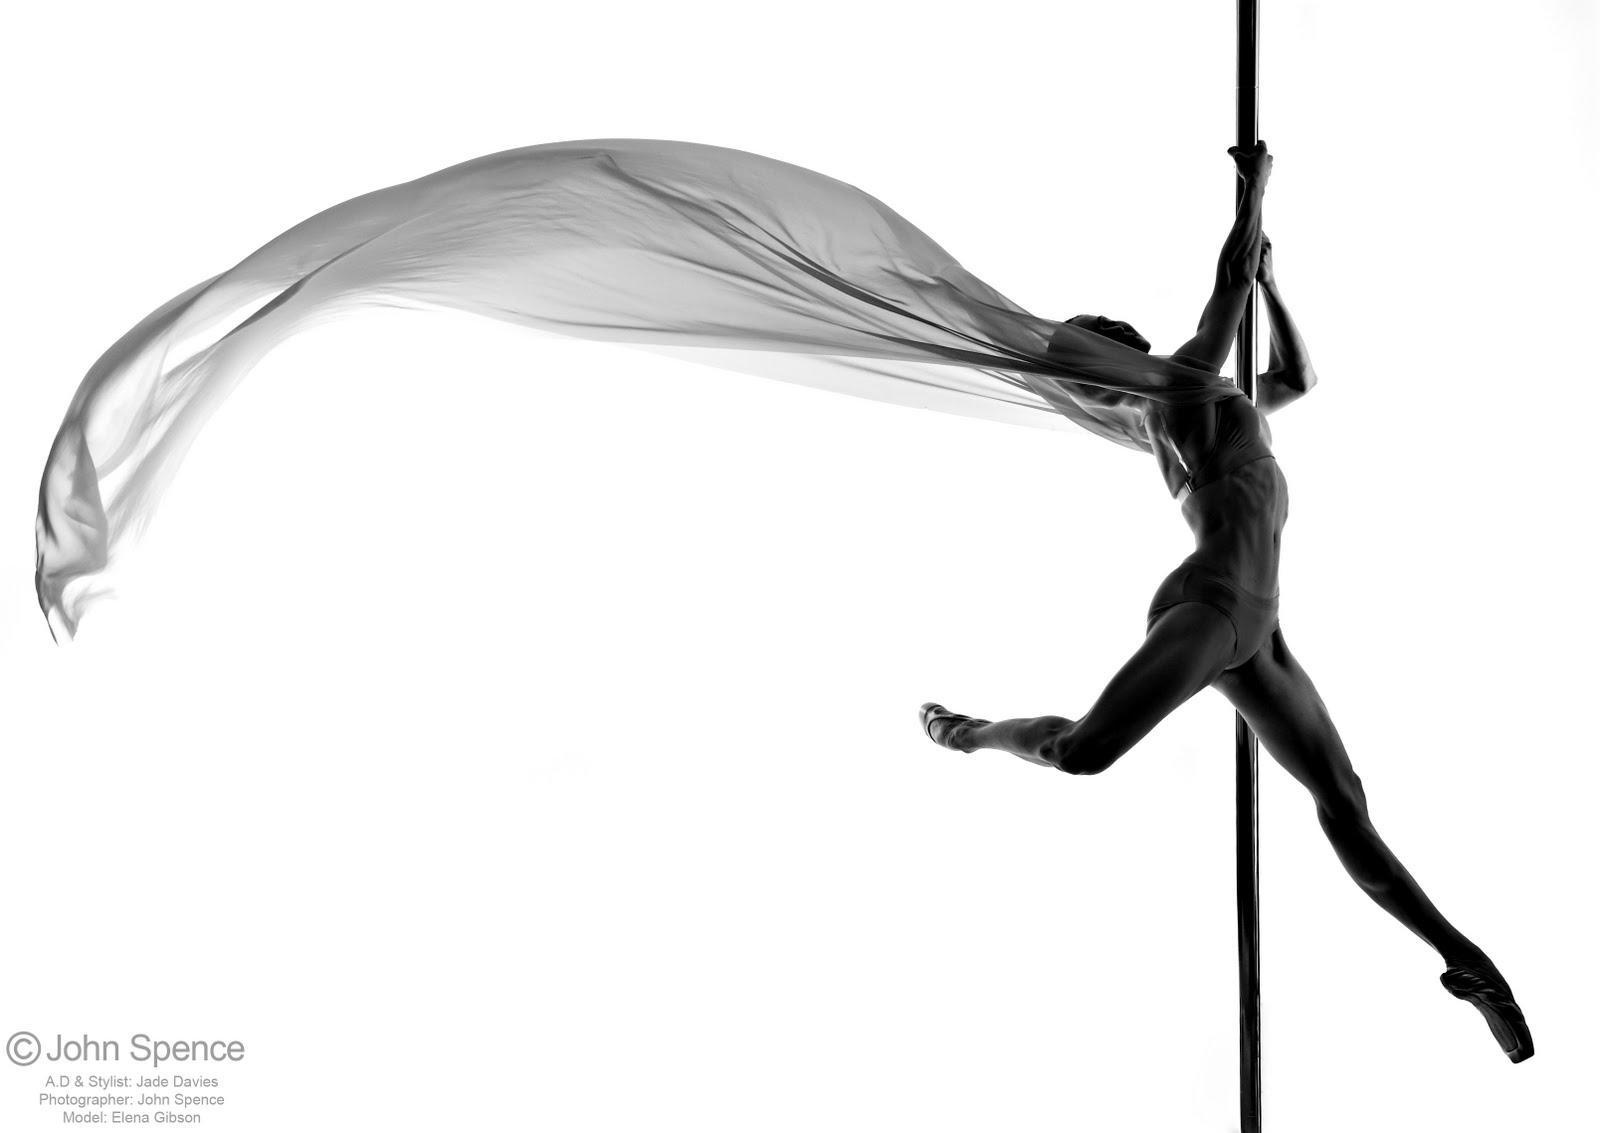 Танец с элементами стриптиза 20 фотография